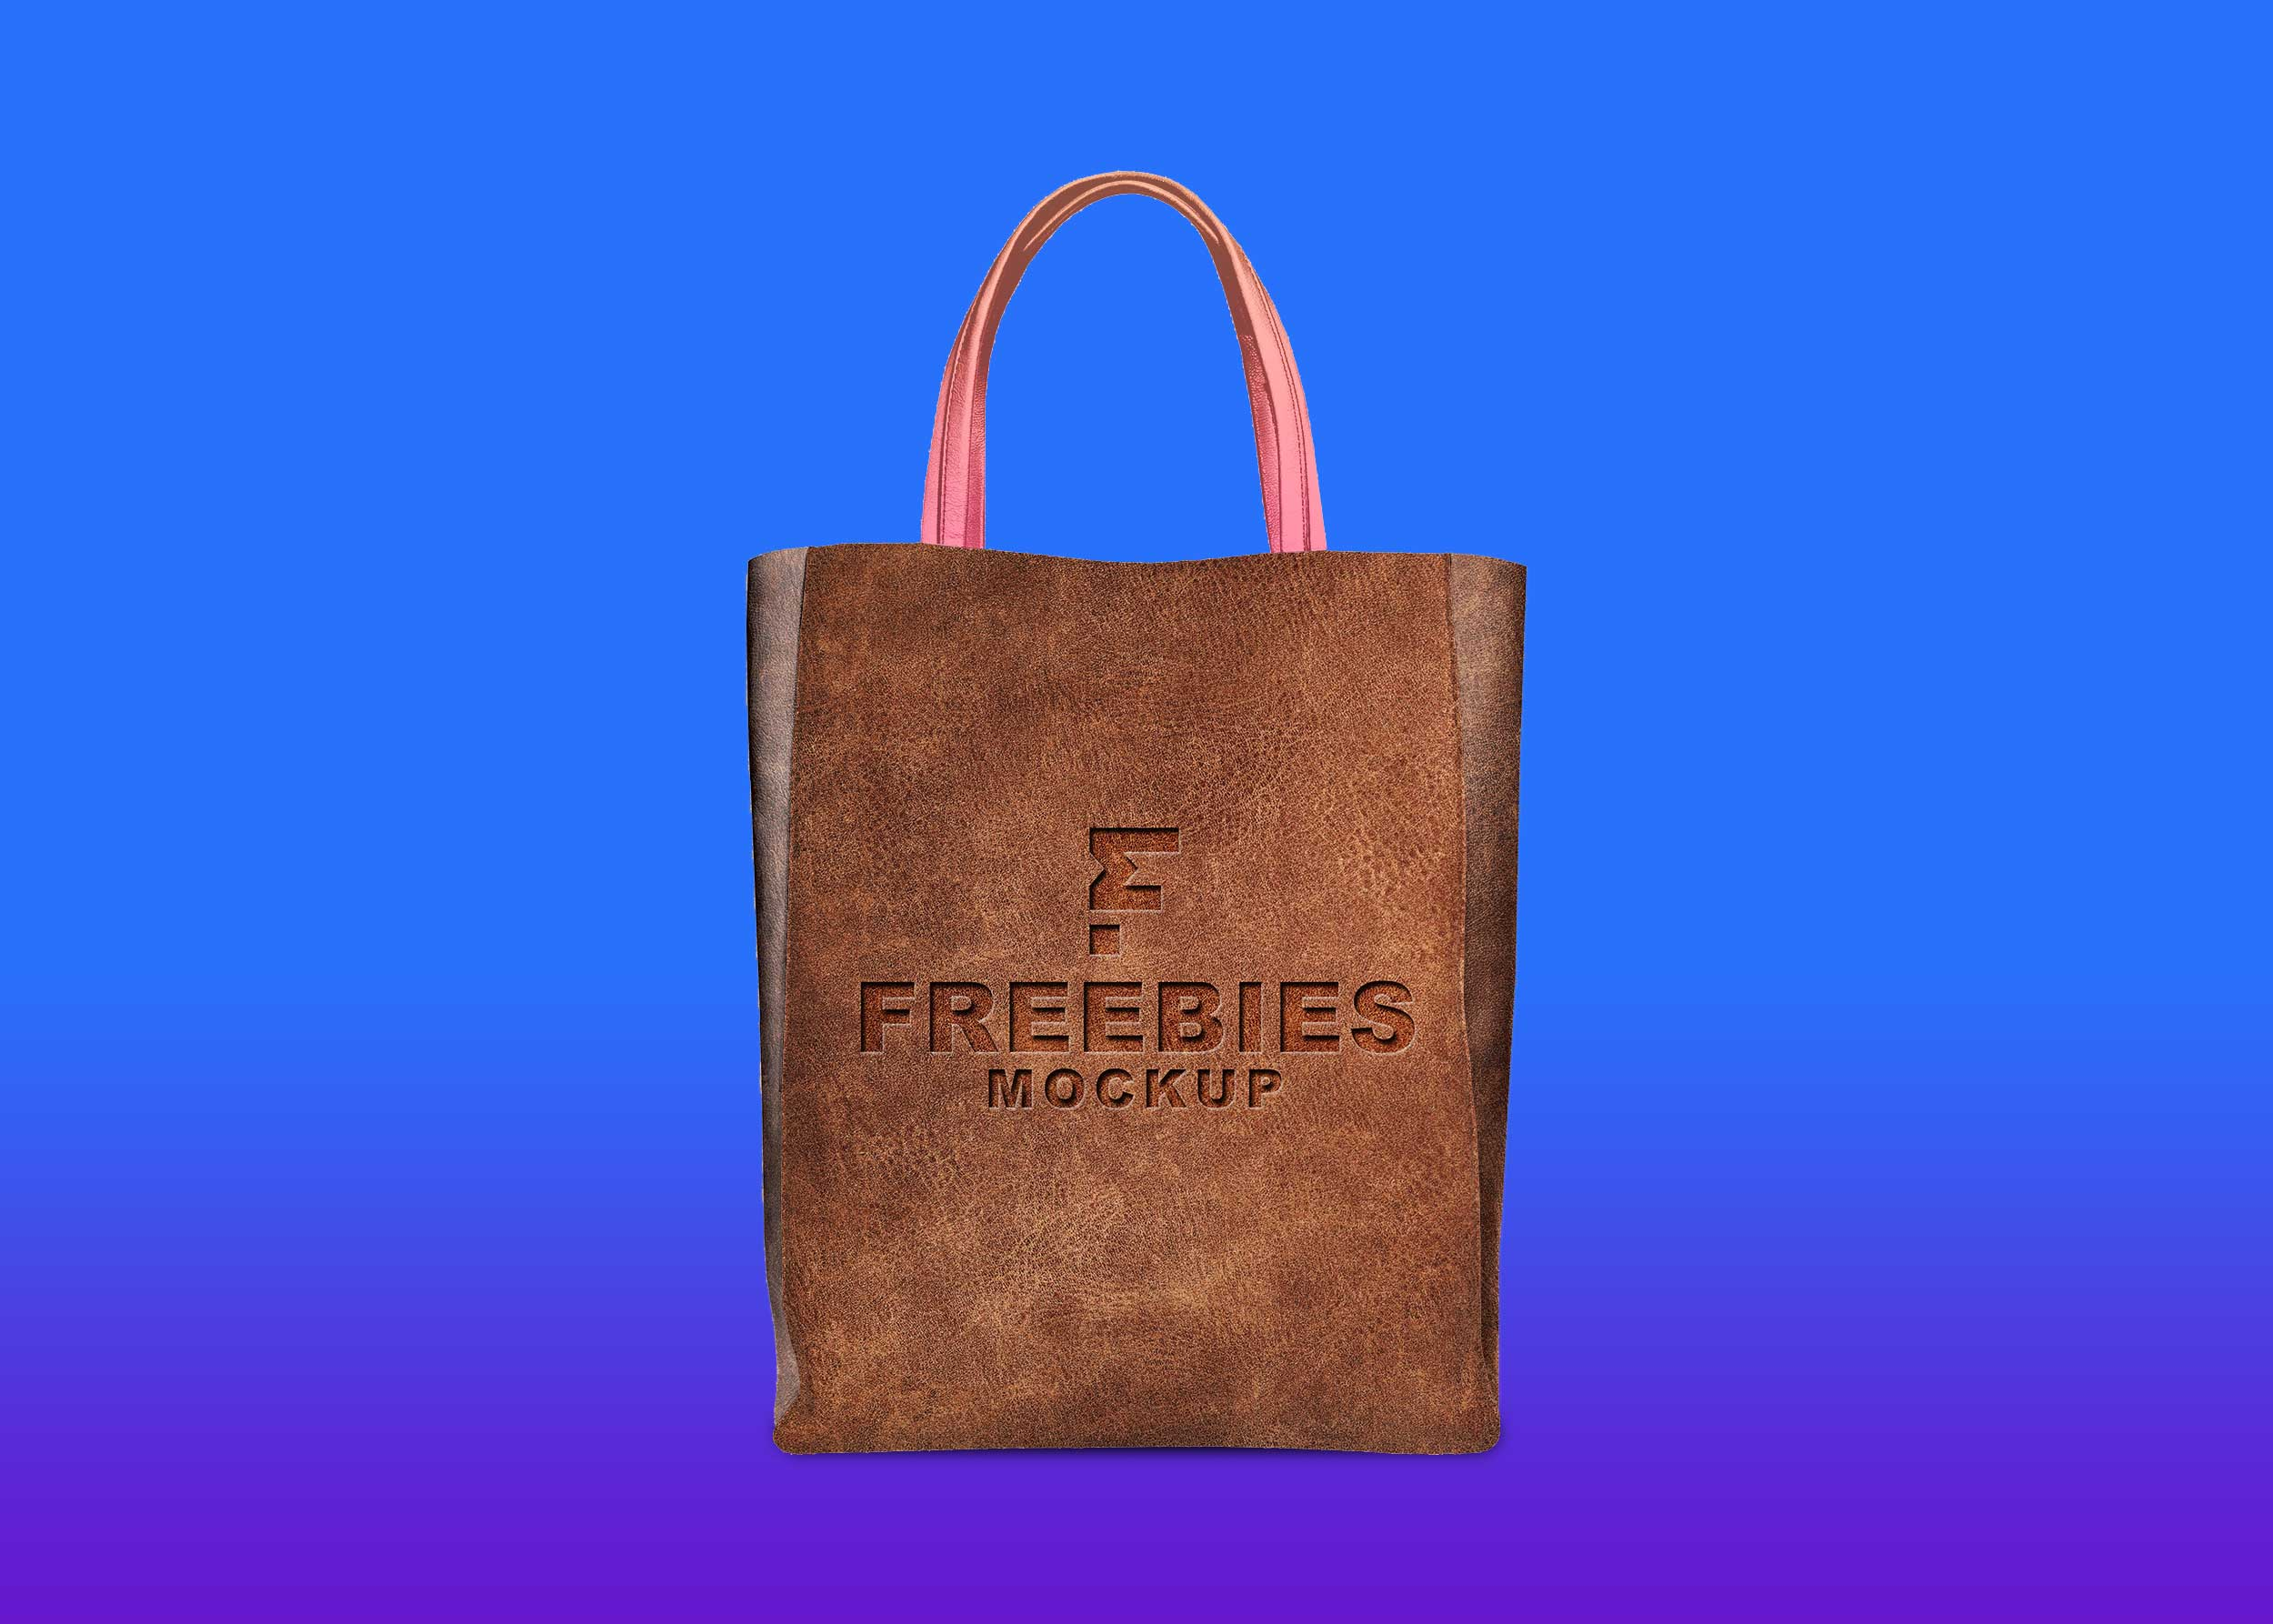 Freebies Leather Bag Mockup